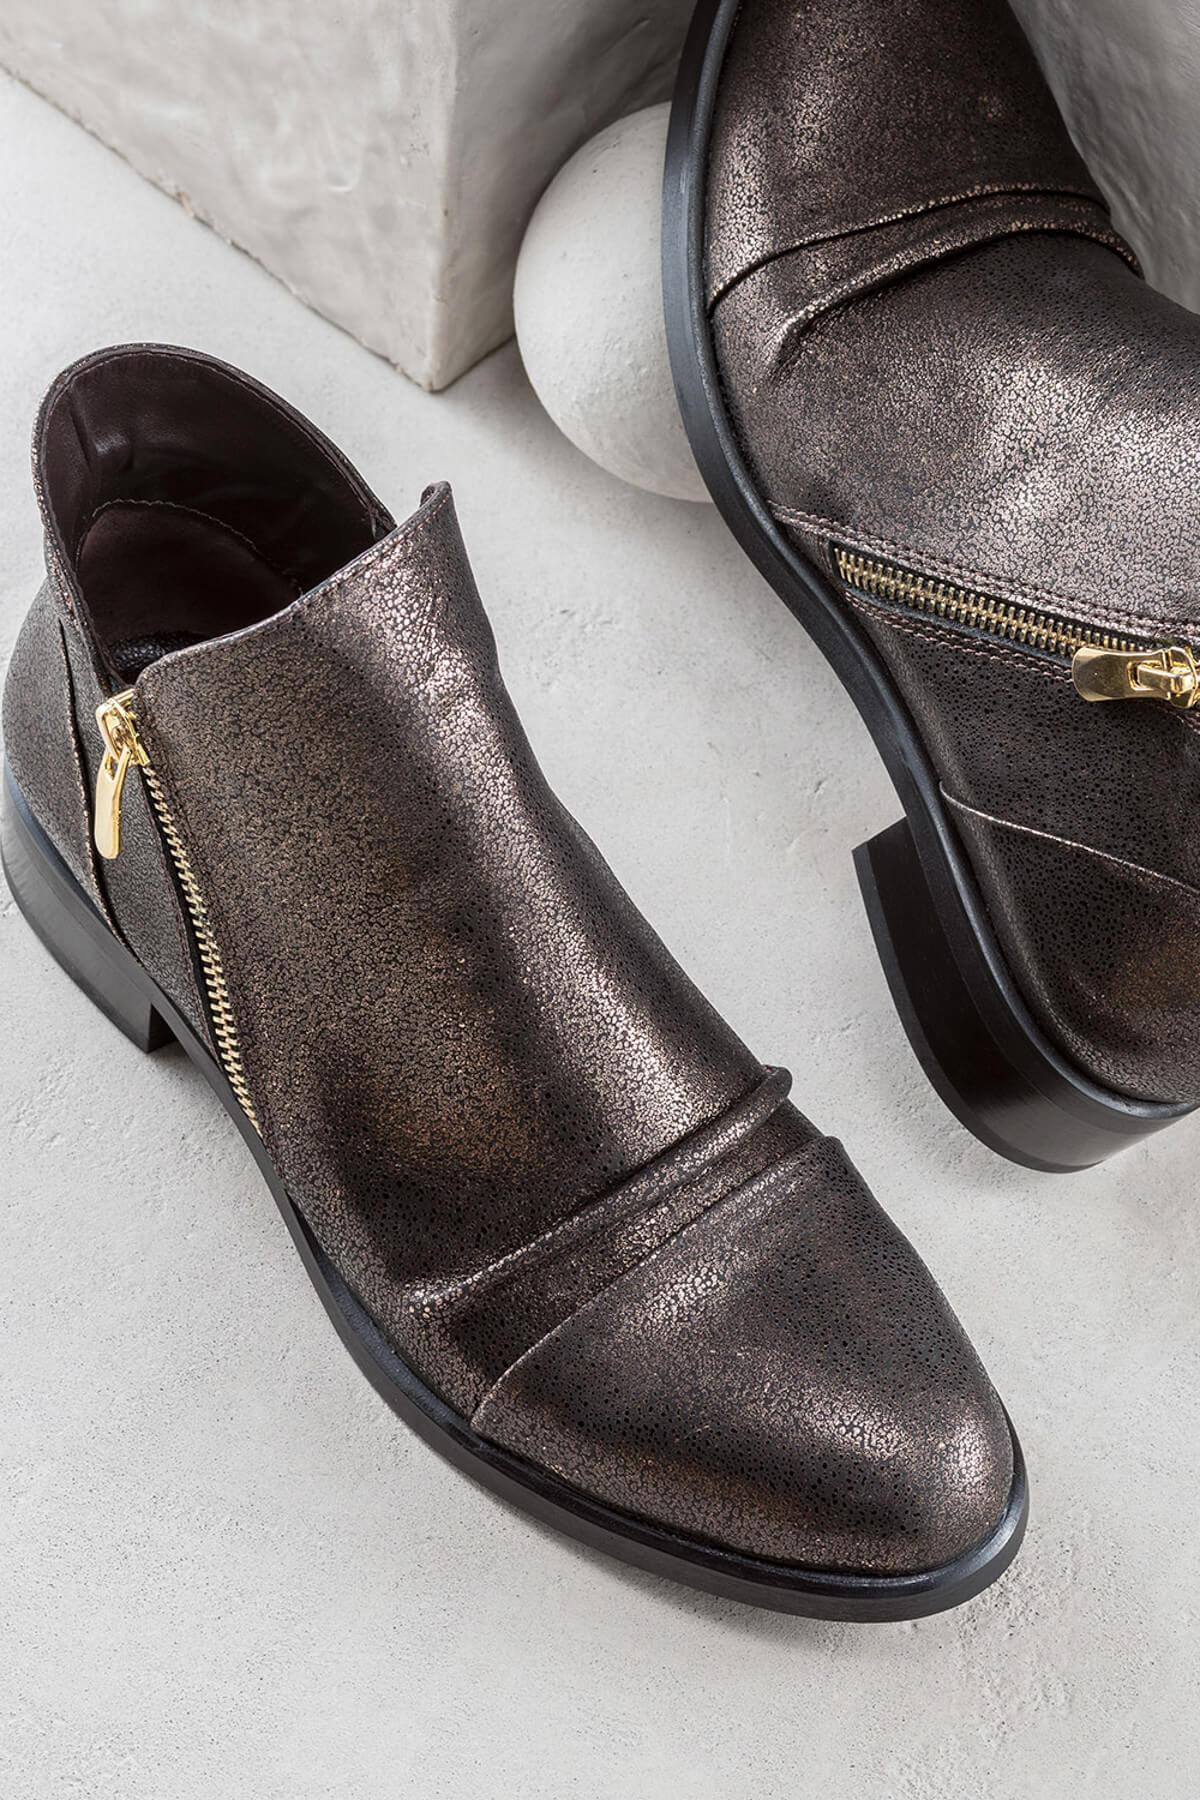 فروش بوت جدید برند Elle Shoes رنگ مشکی کد ty857547